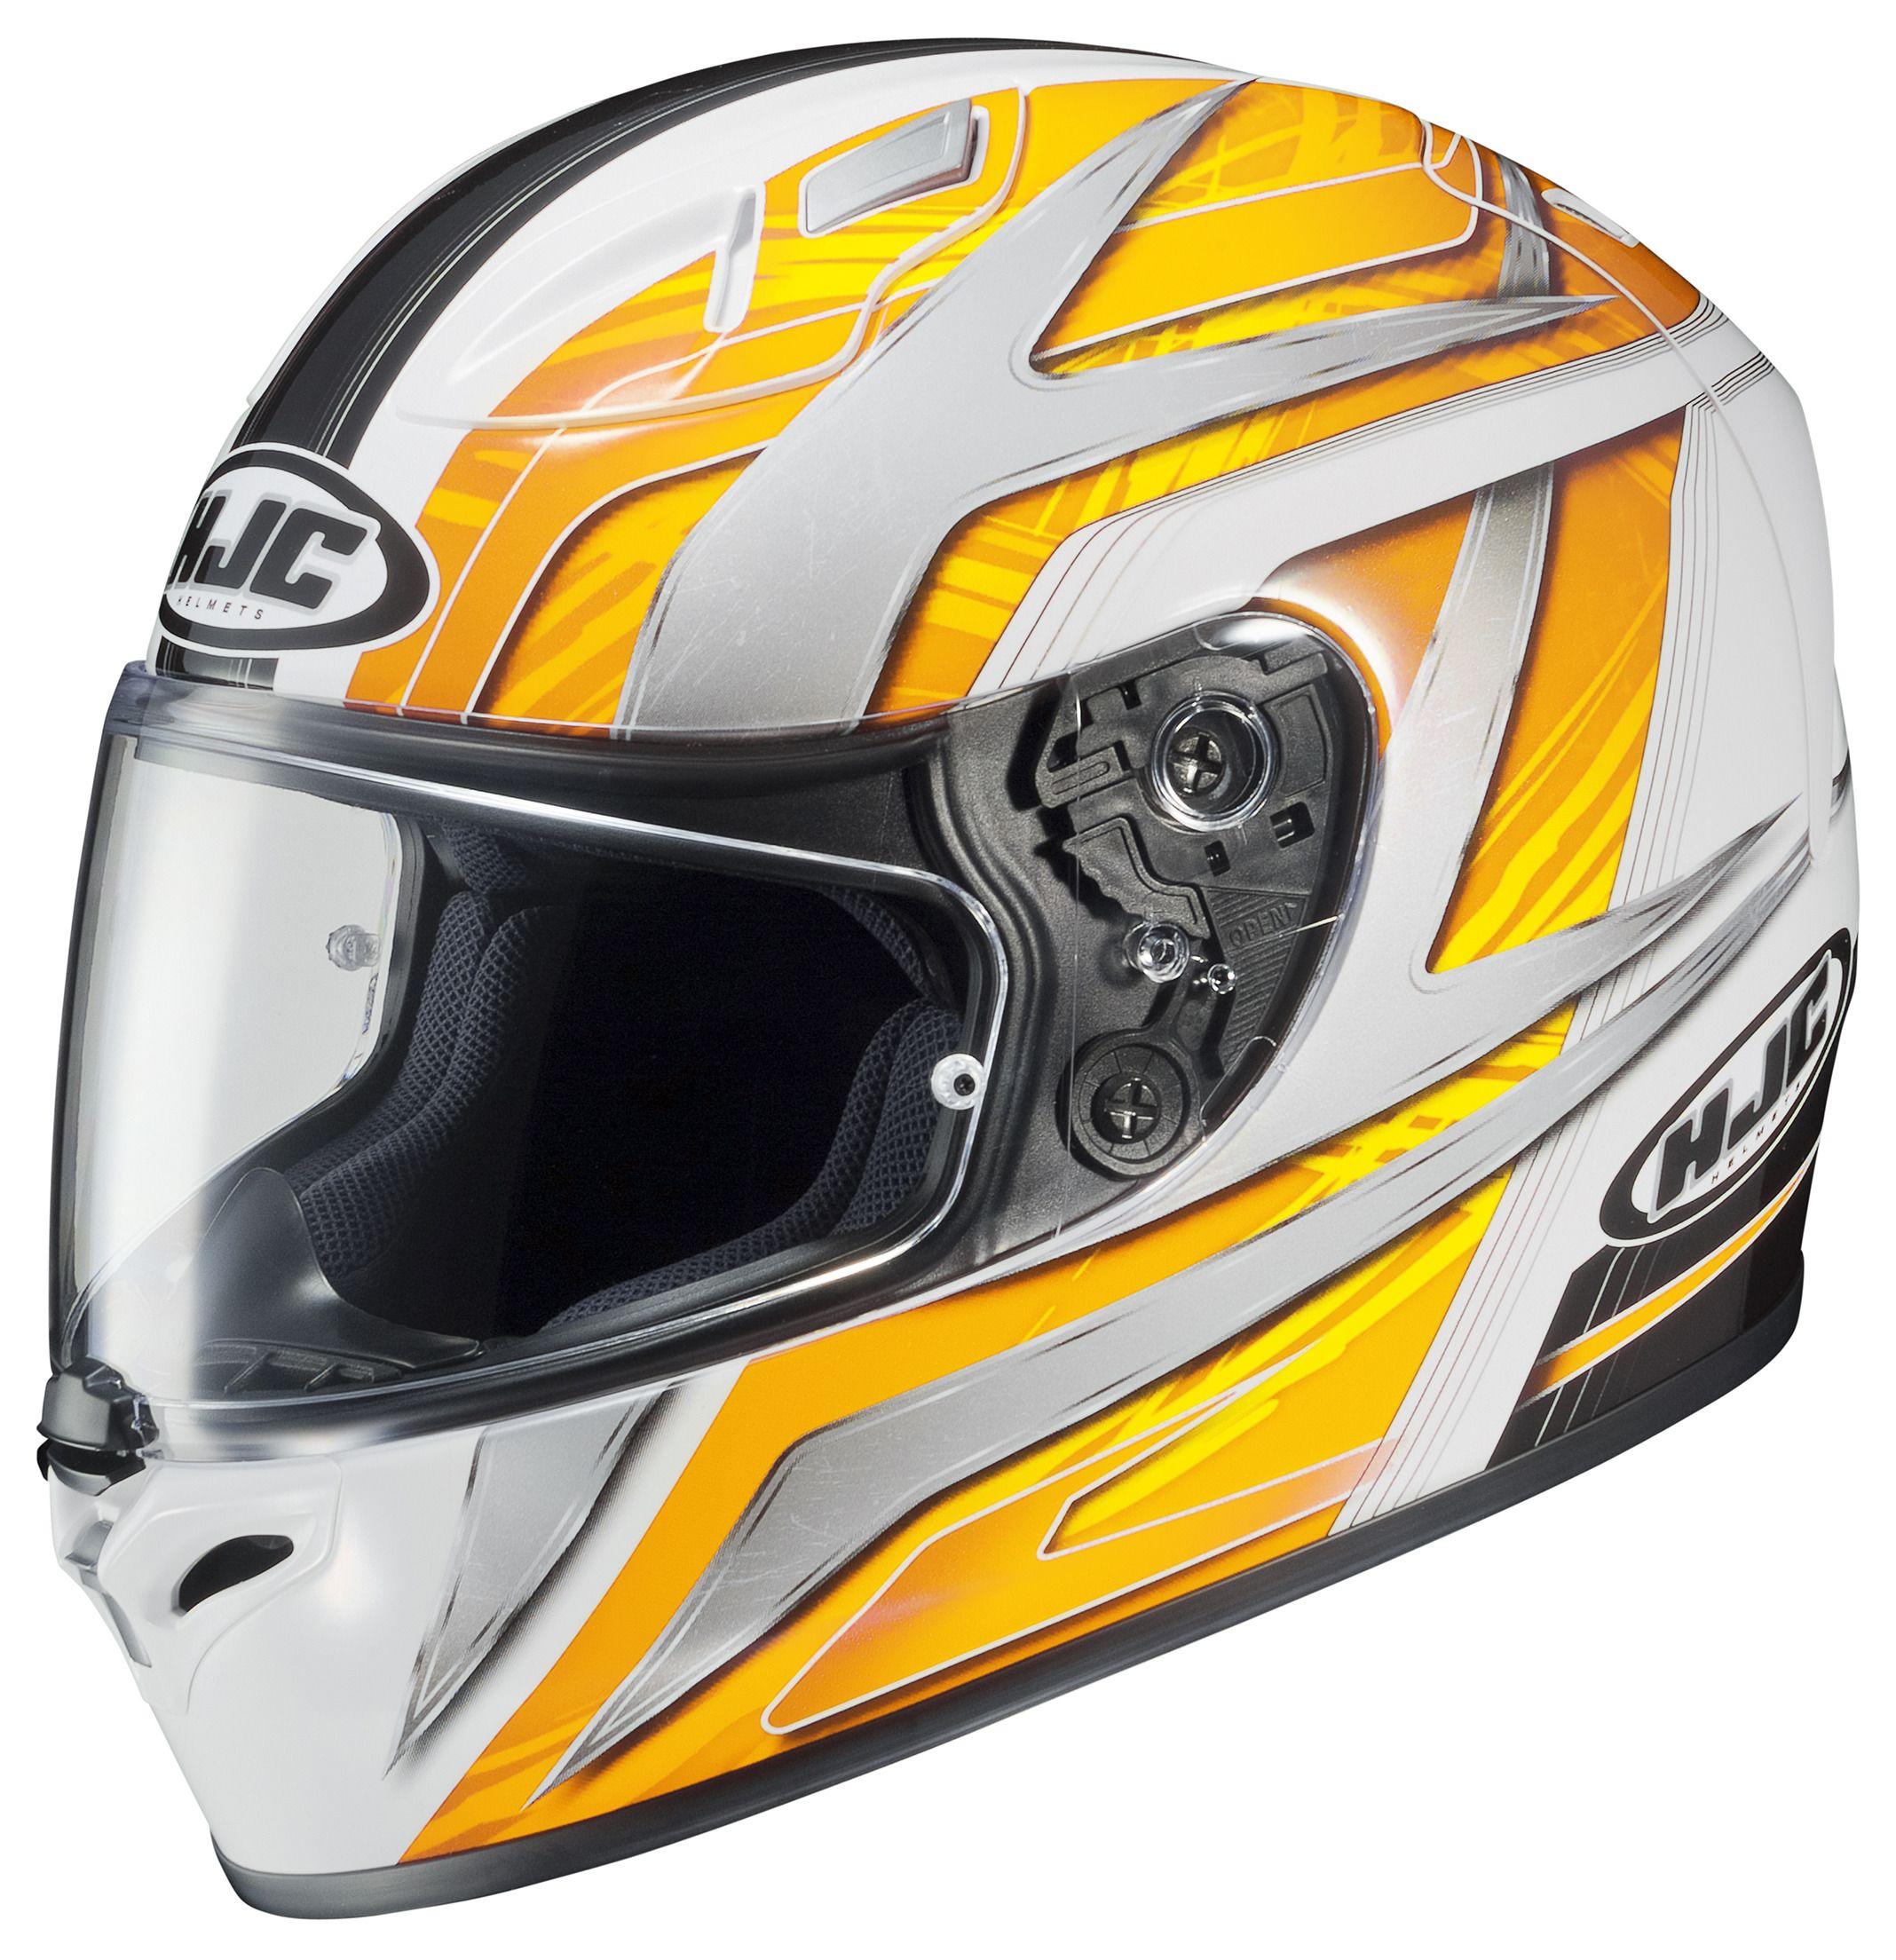 hjc fg 17 ace helmet size xs only revzilla. Black Bedroom Furniture Sets. Home Design Ideas